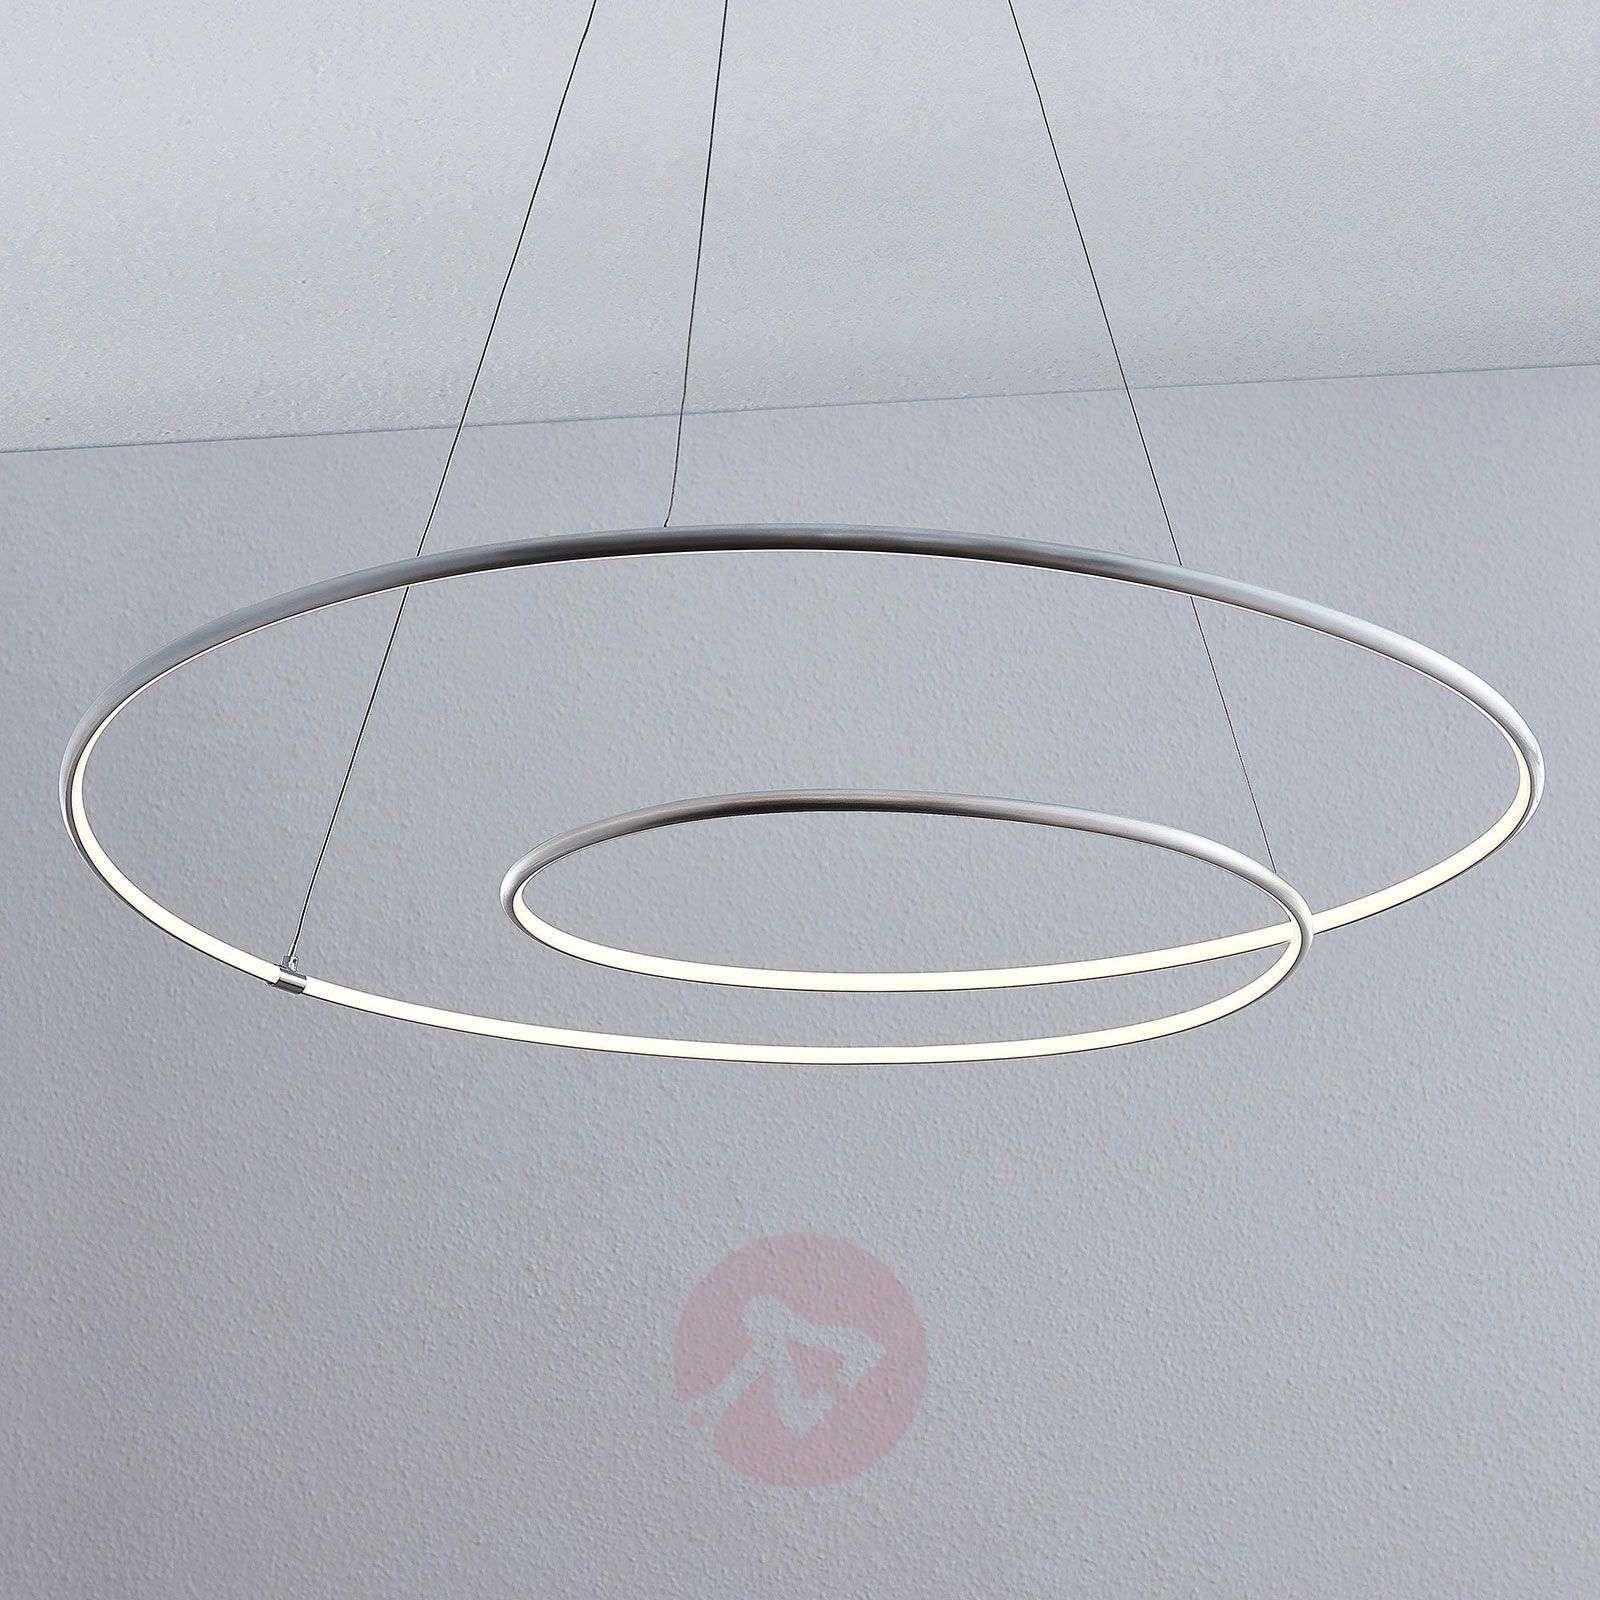 Lindby Lucy LED-riippuvalaisin, 90 cm, alumiini-9639147-02